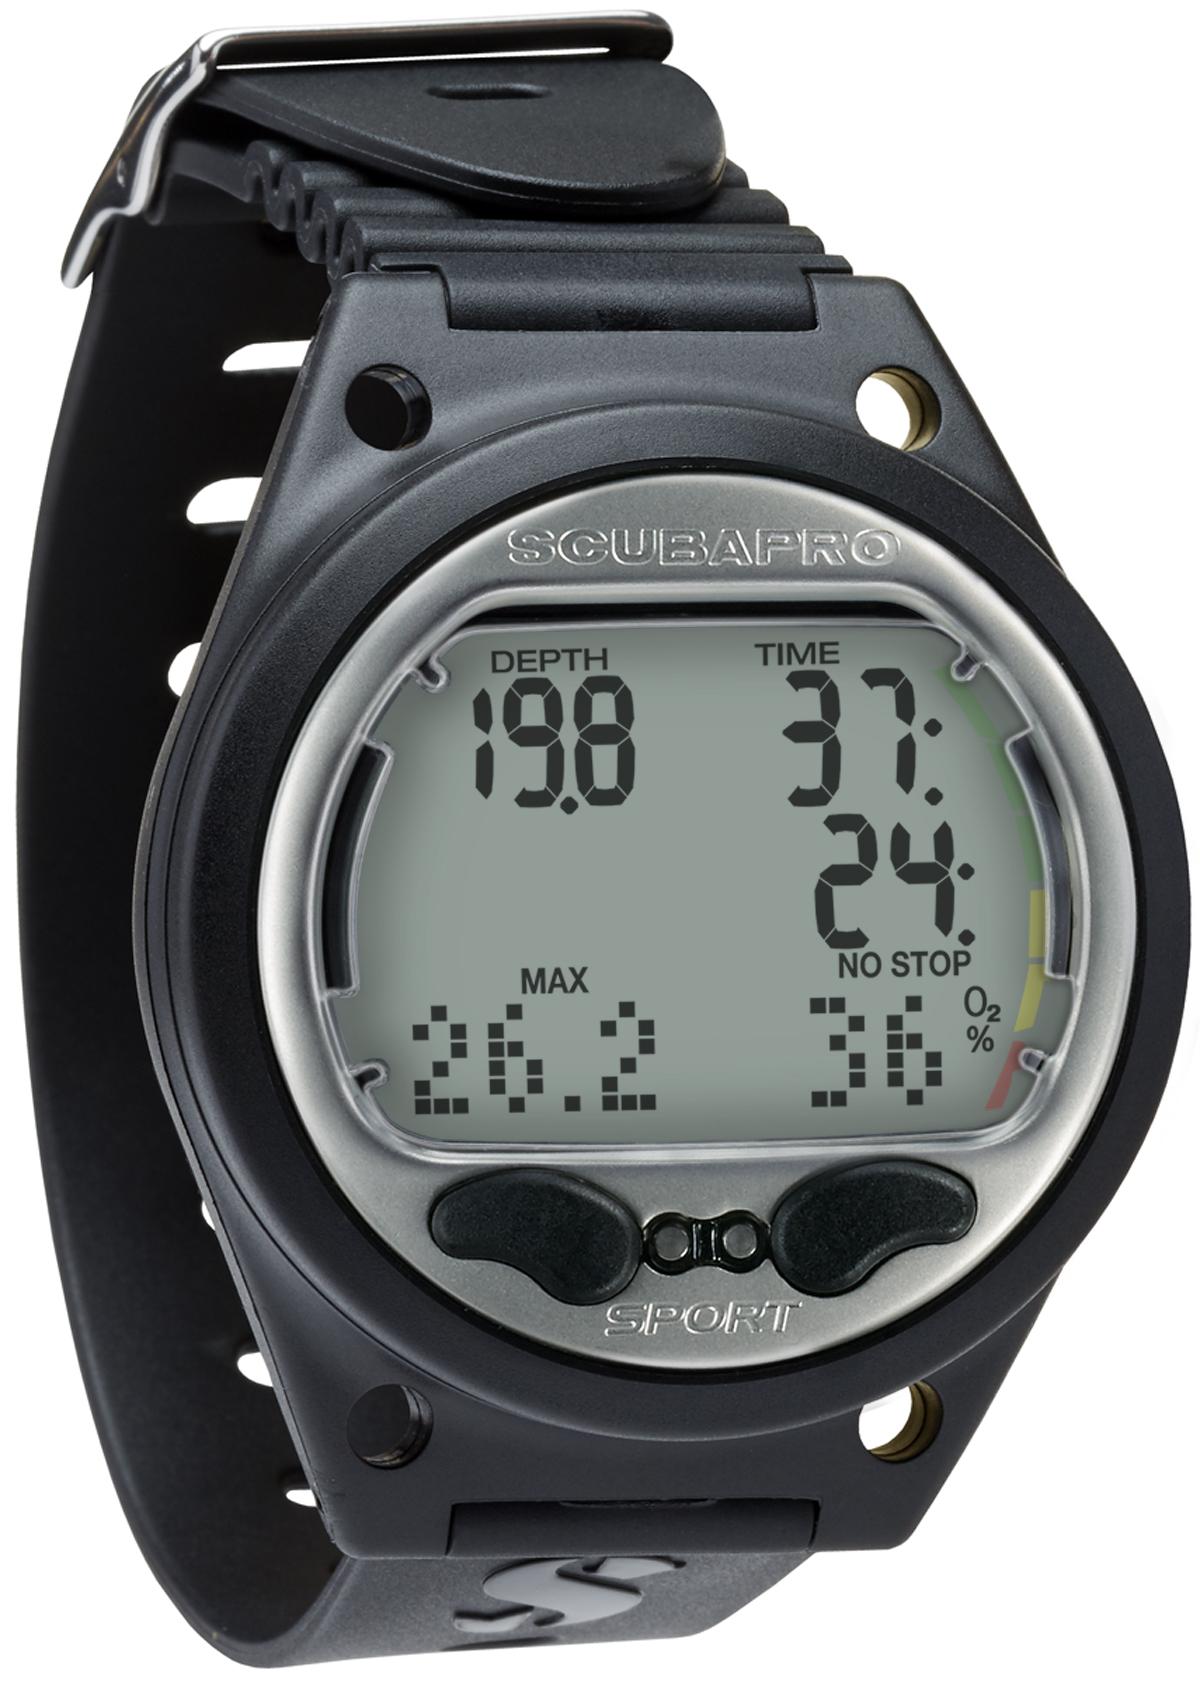 aladin-sport_wrist-computer_metric